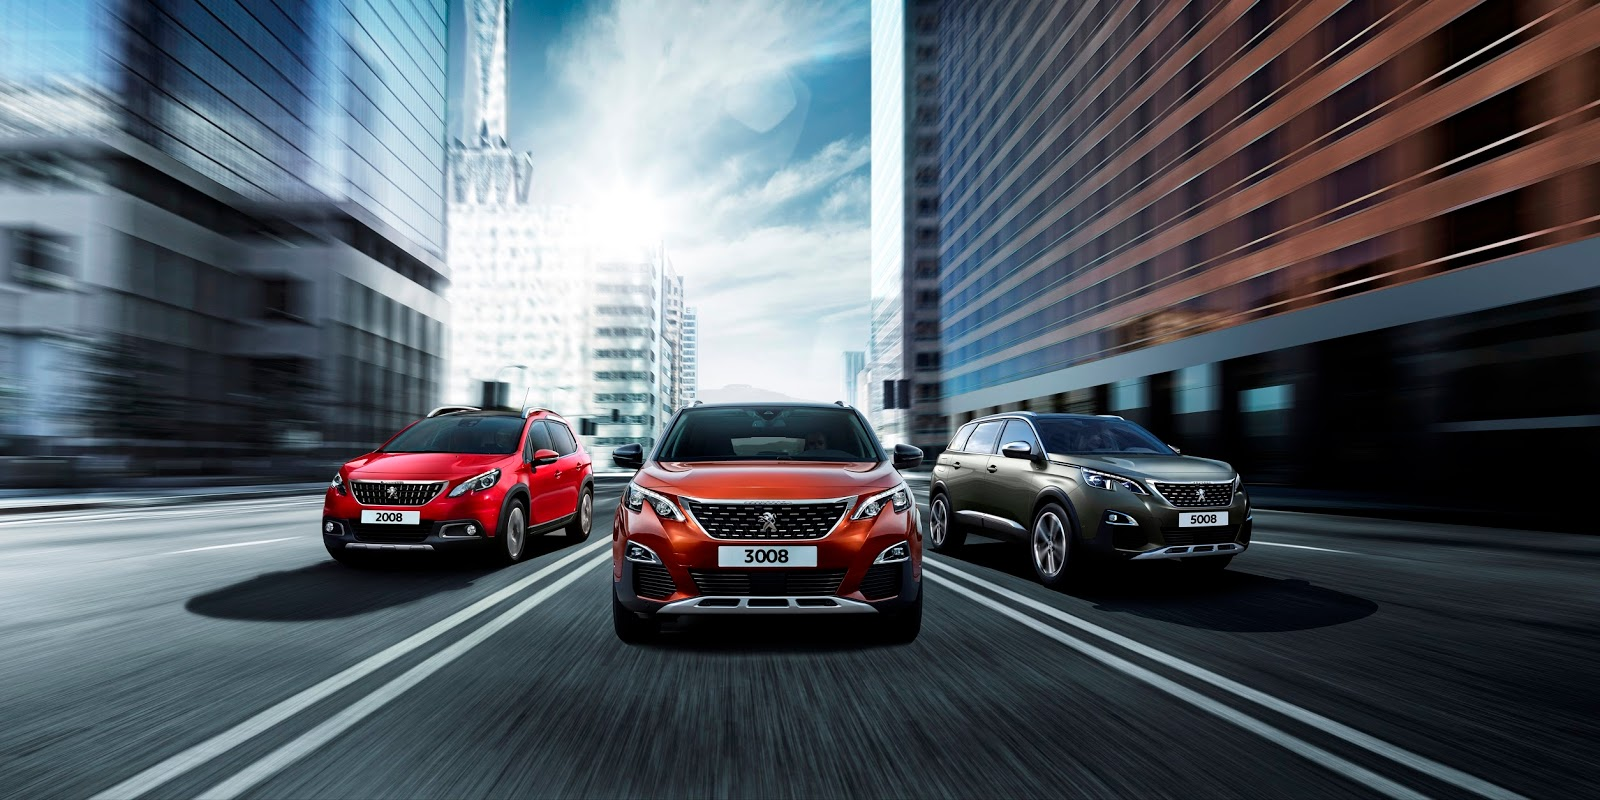 SUV2BFAMILY2BPHOTO lowRes PEUGEOT: Αδιαμφισβήτητος ηγέτης στην Γαλλική αγορά αυτοκινήτου το 2017 Peugeot, Sales, πωλήσεις, πωλήσεις αυτοκινήτων